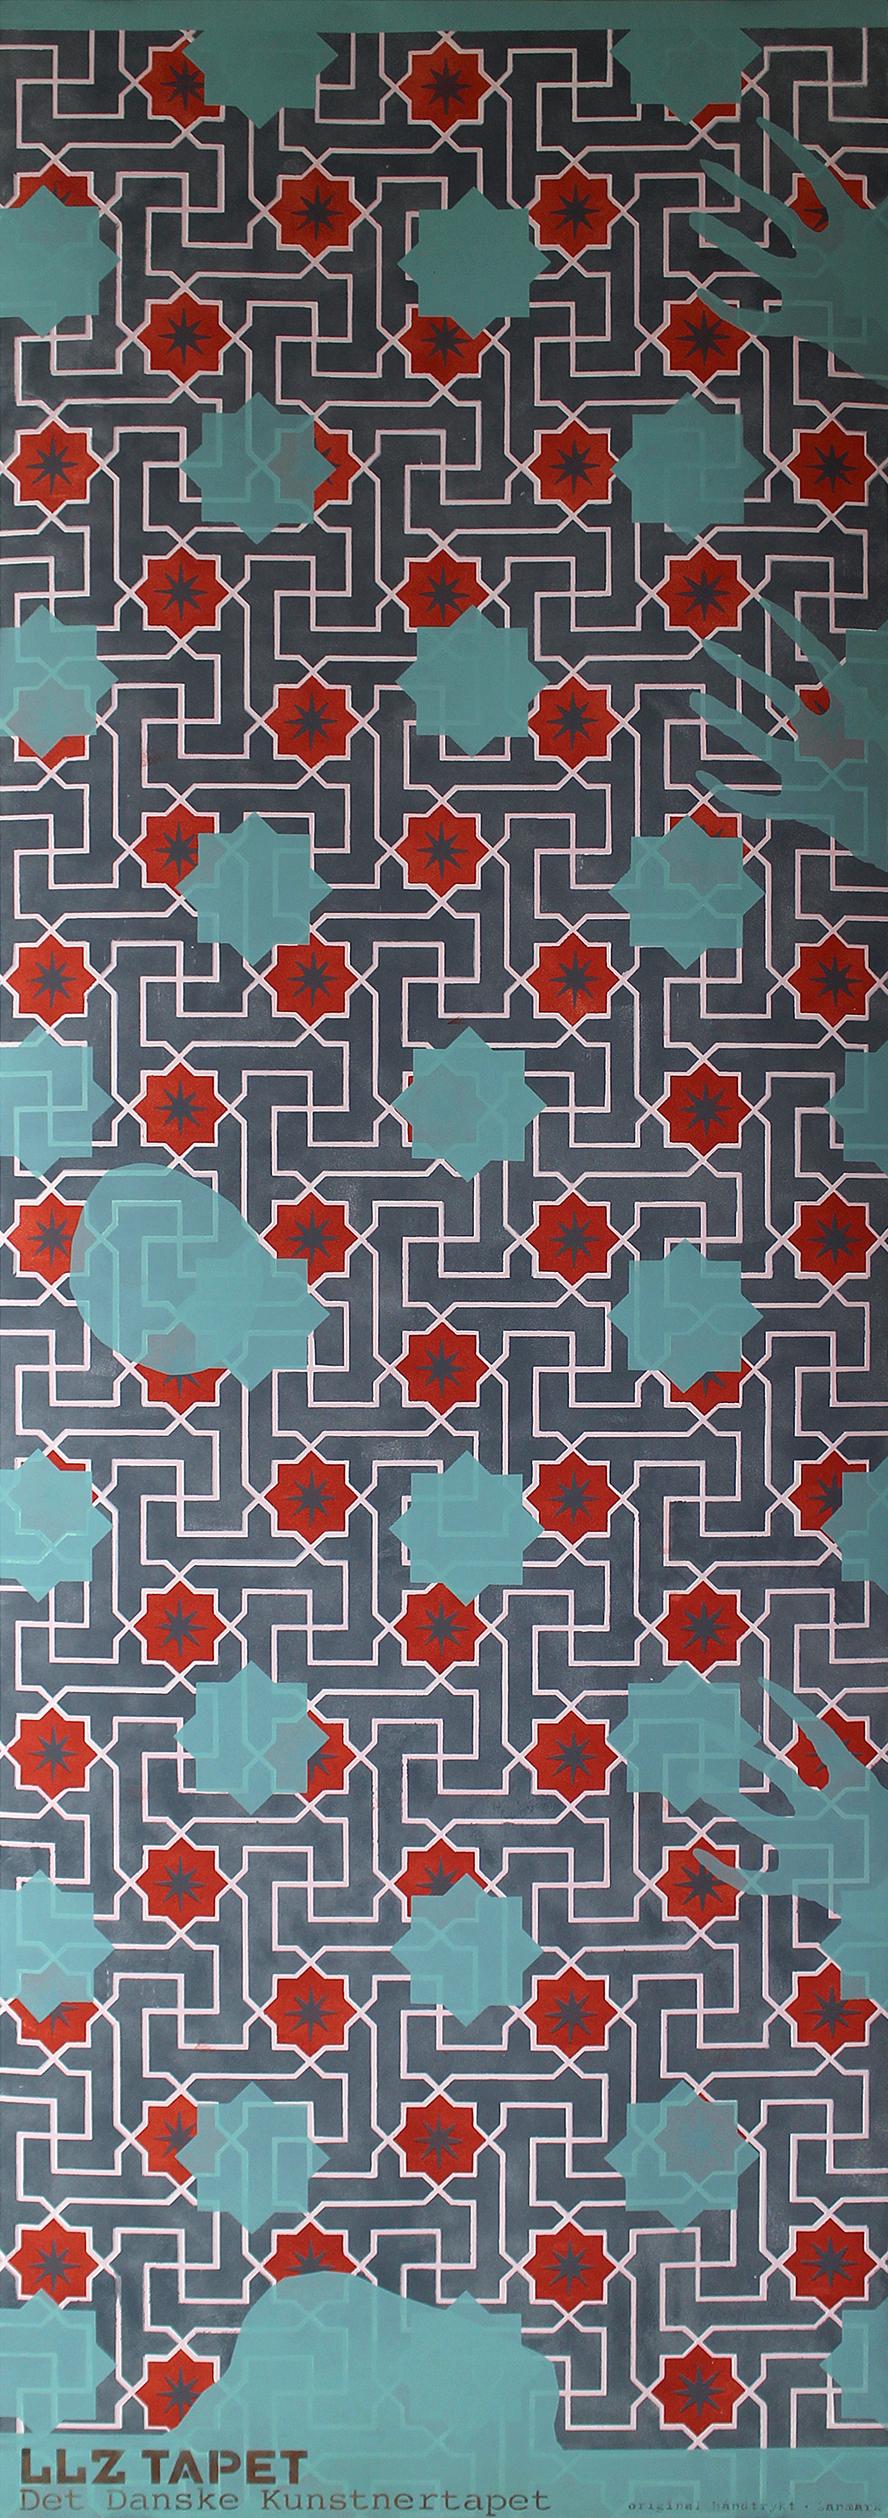 Willumsen og Alhambramønstret 12. Original håndtrykt på nonwoven 140 g´ tapetpapir med kompositionsfarver. Måler 56 x 160 cm. Prisen er 2.300,-